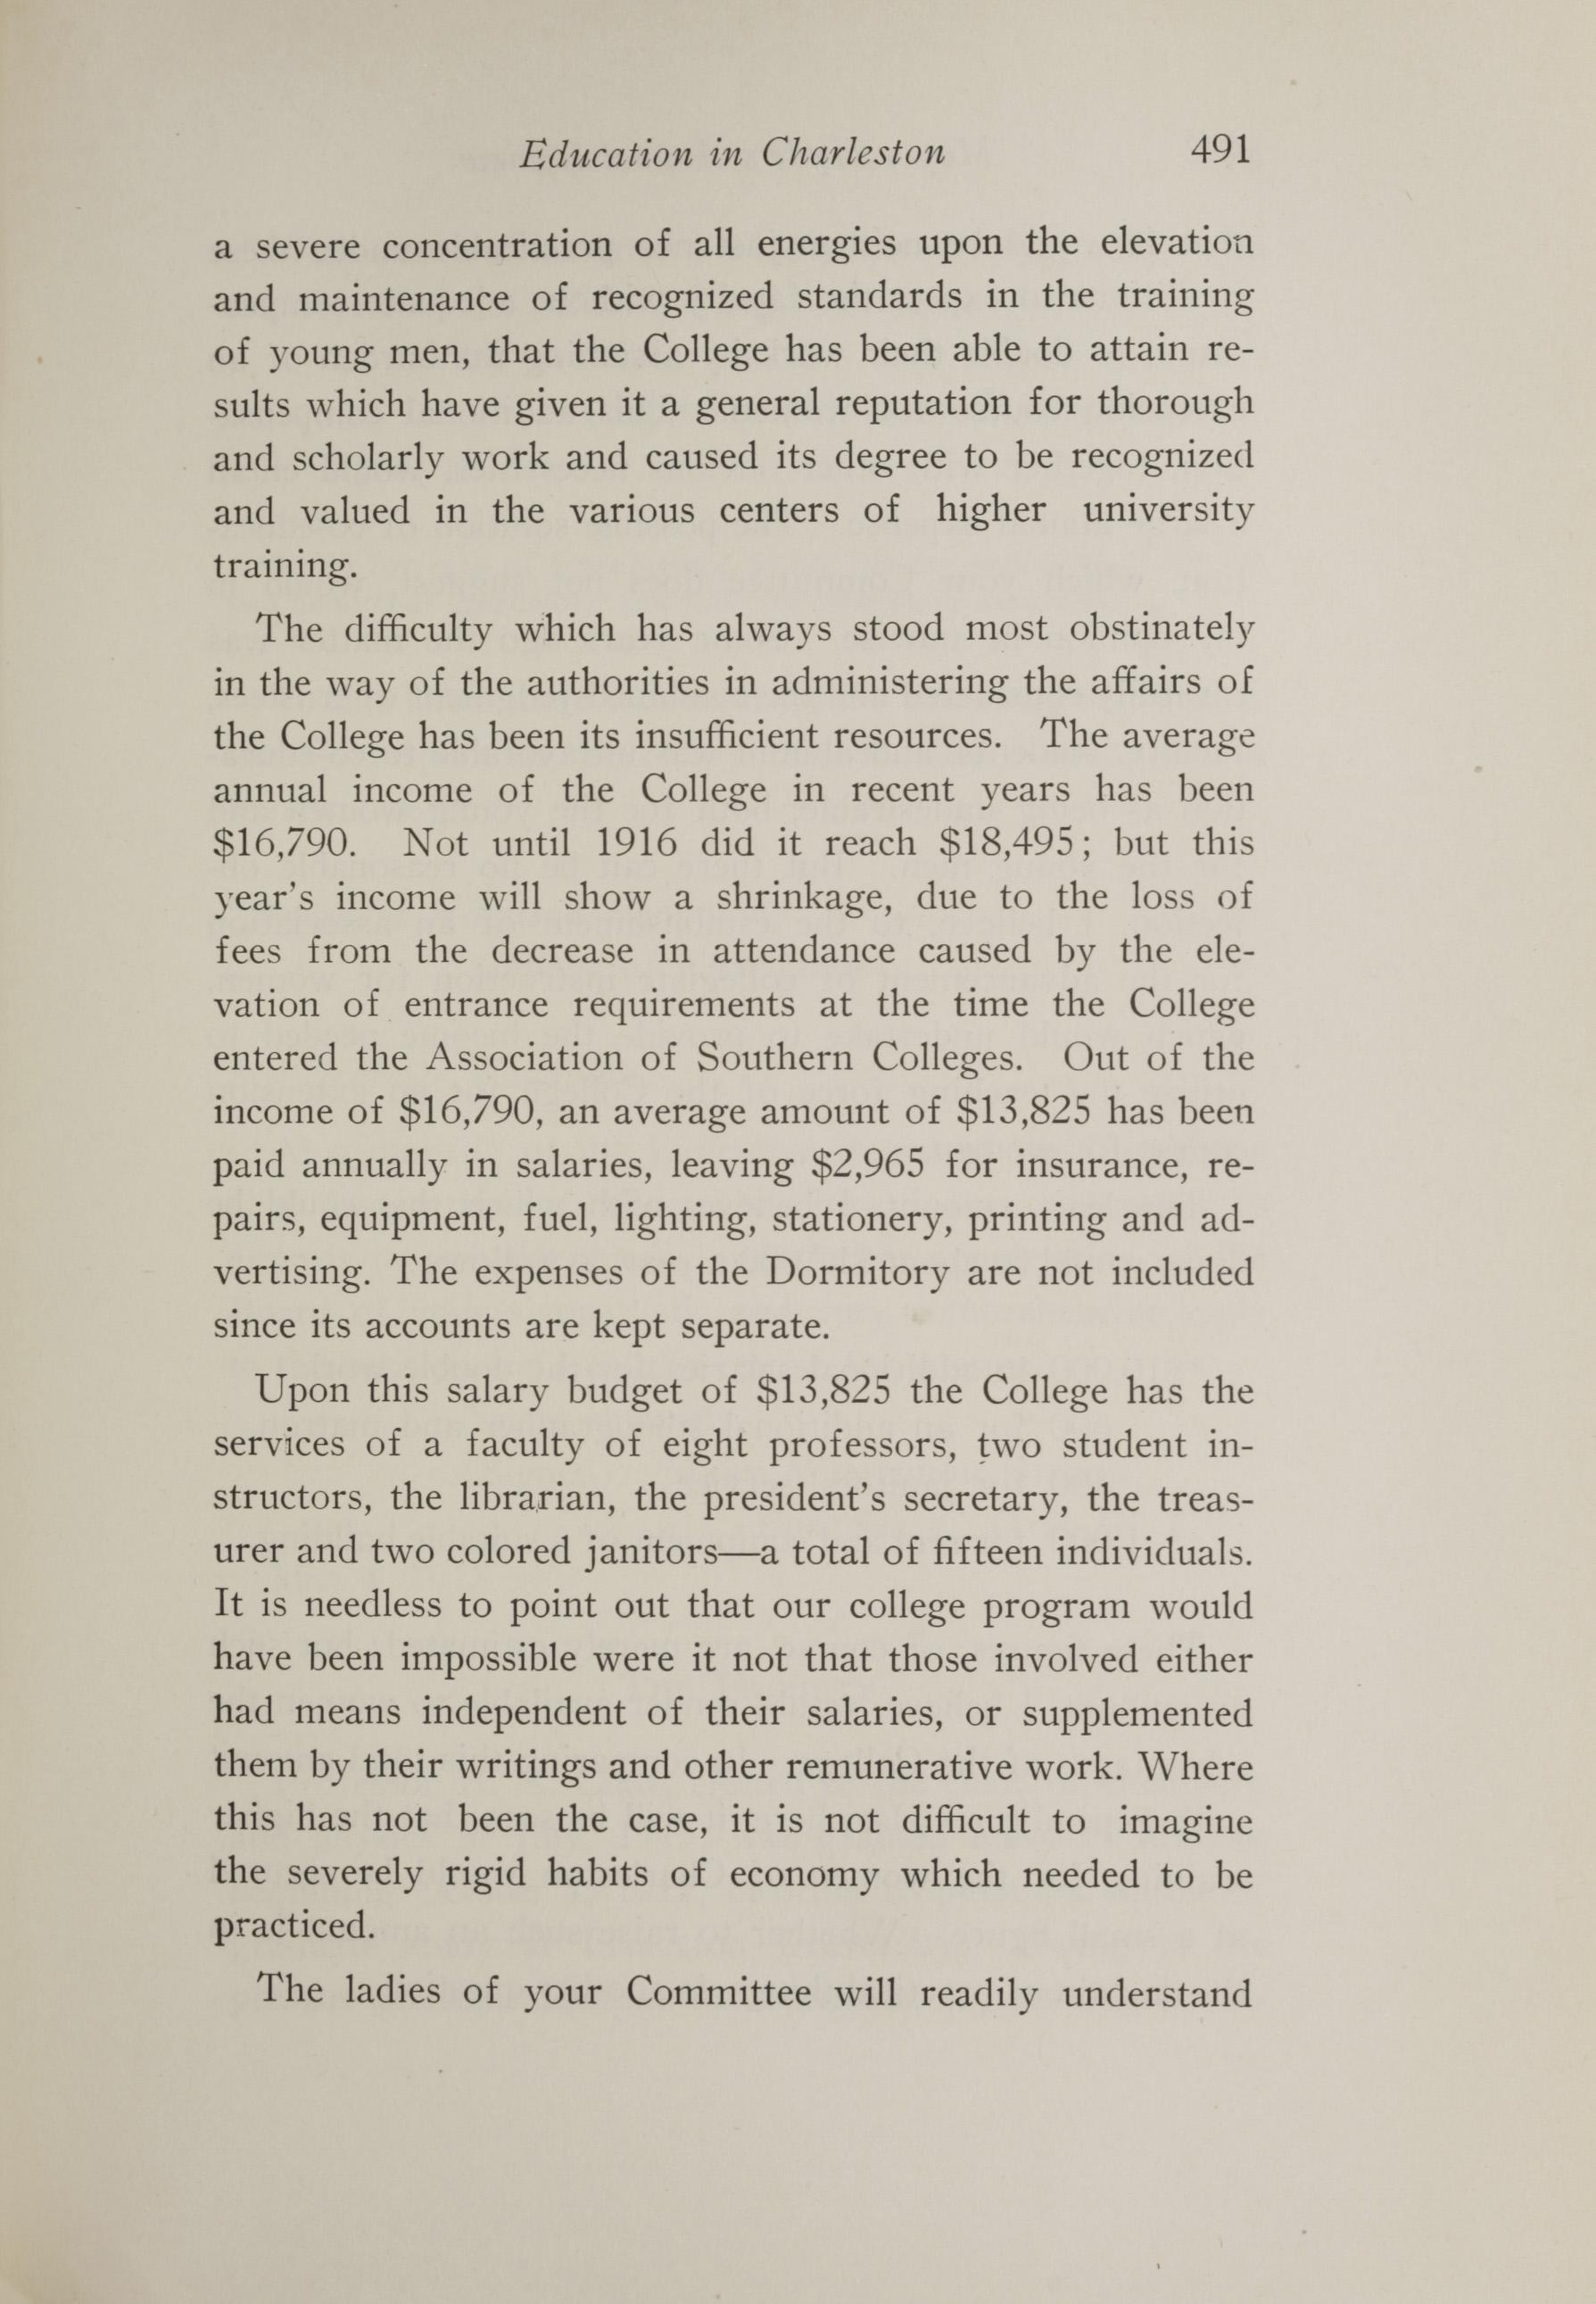 Charleston Yearbook, 1917, page 491